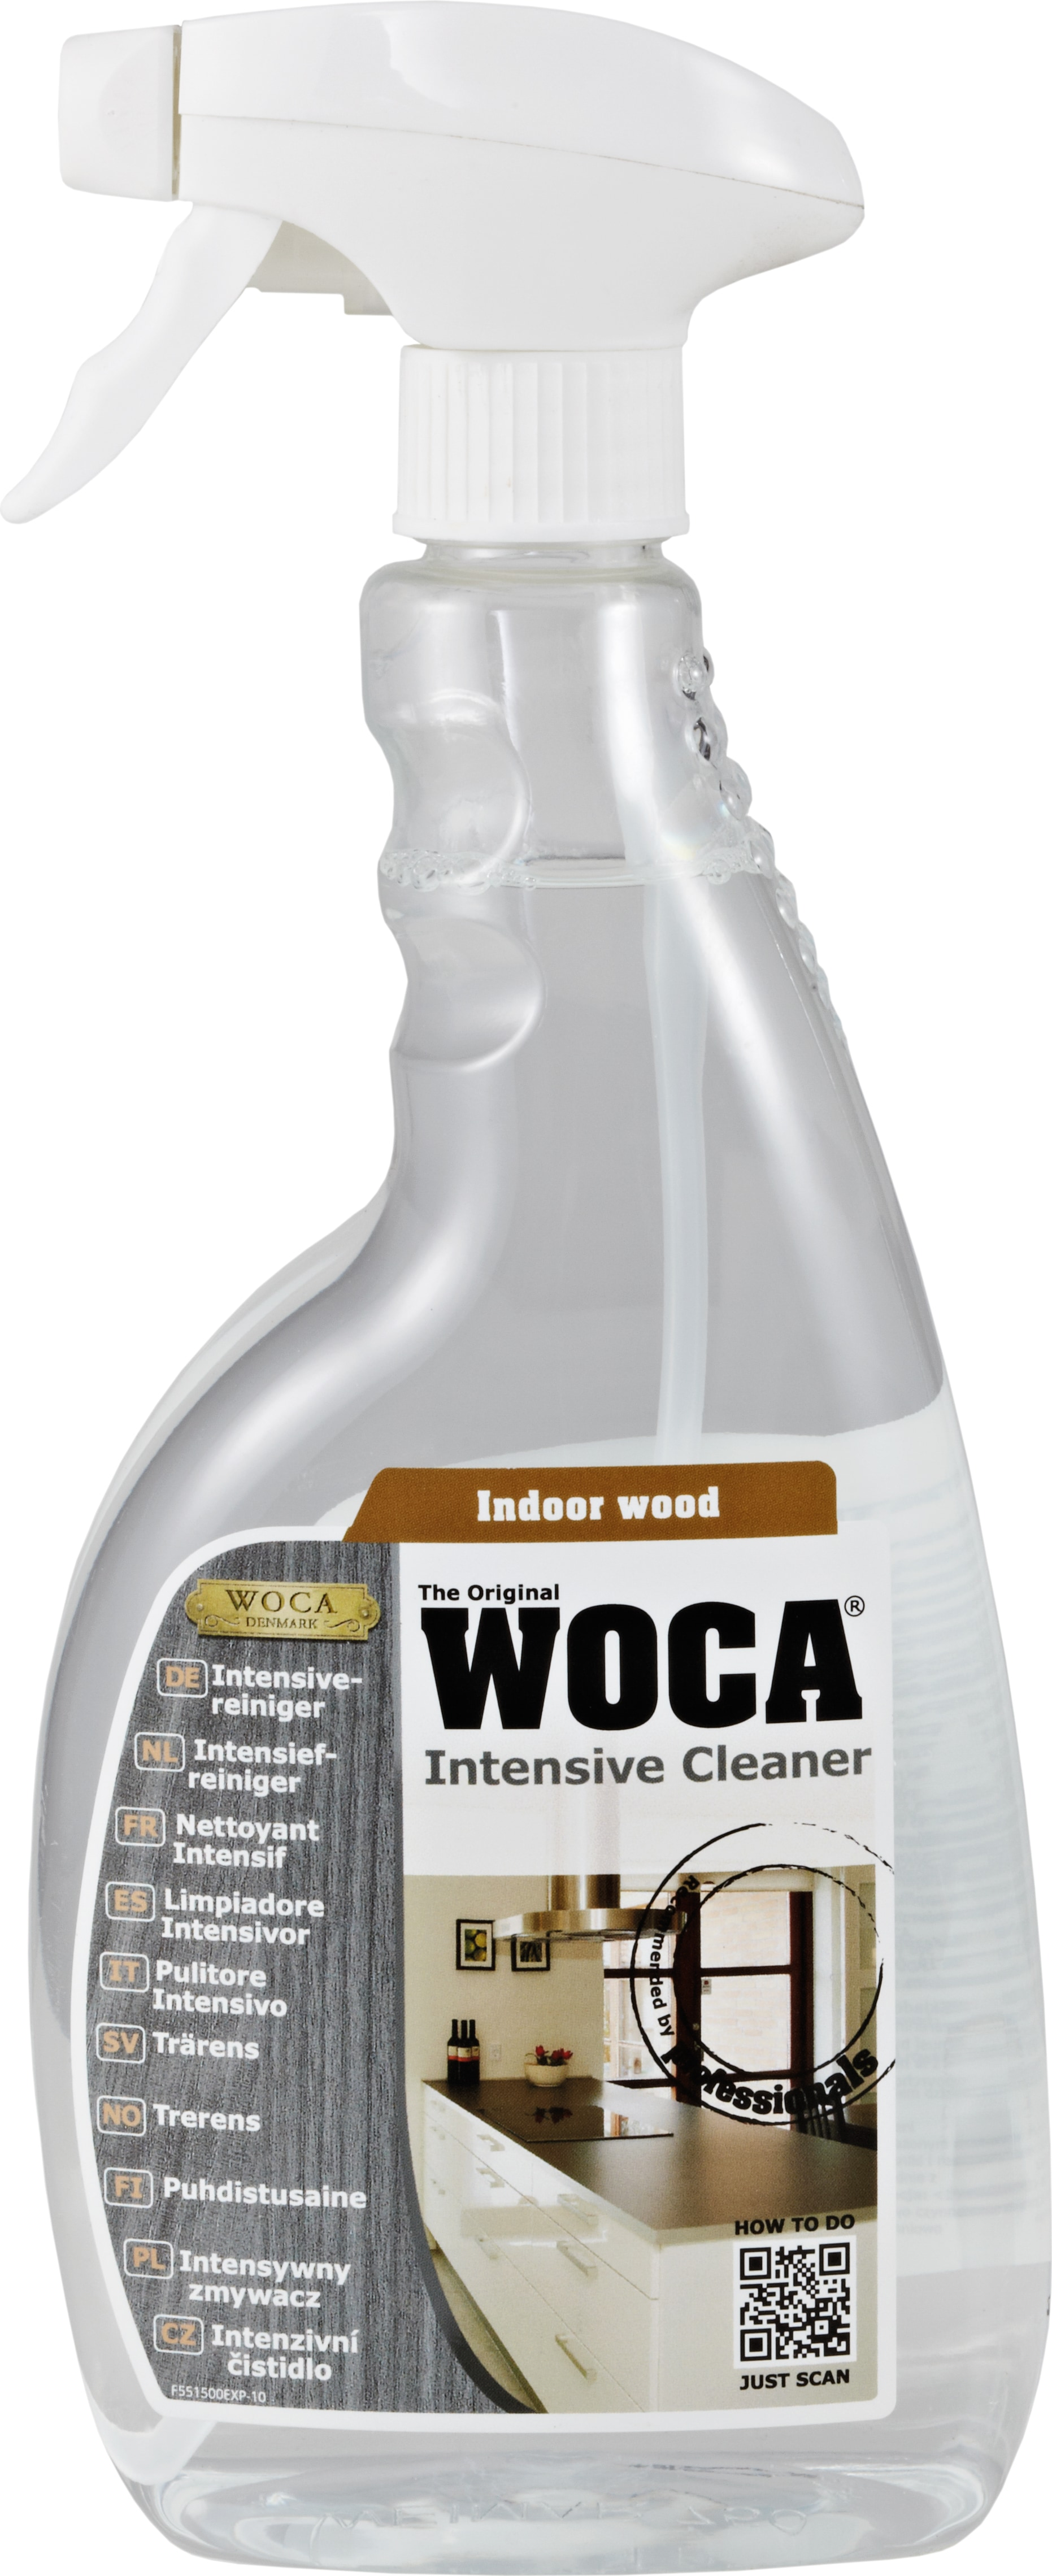 Intensive Cleaner Spray 0.75 ltr / Single Butcher Block Accessories 0